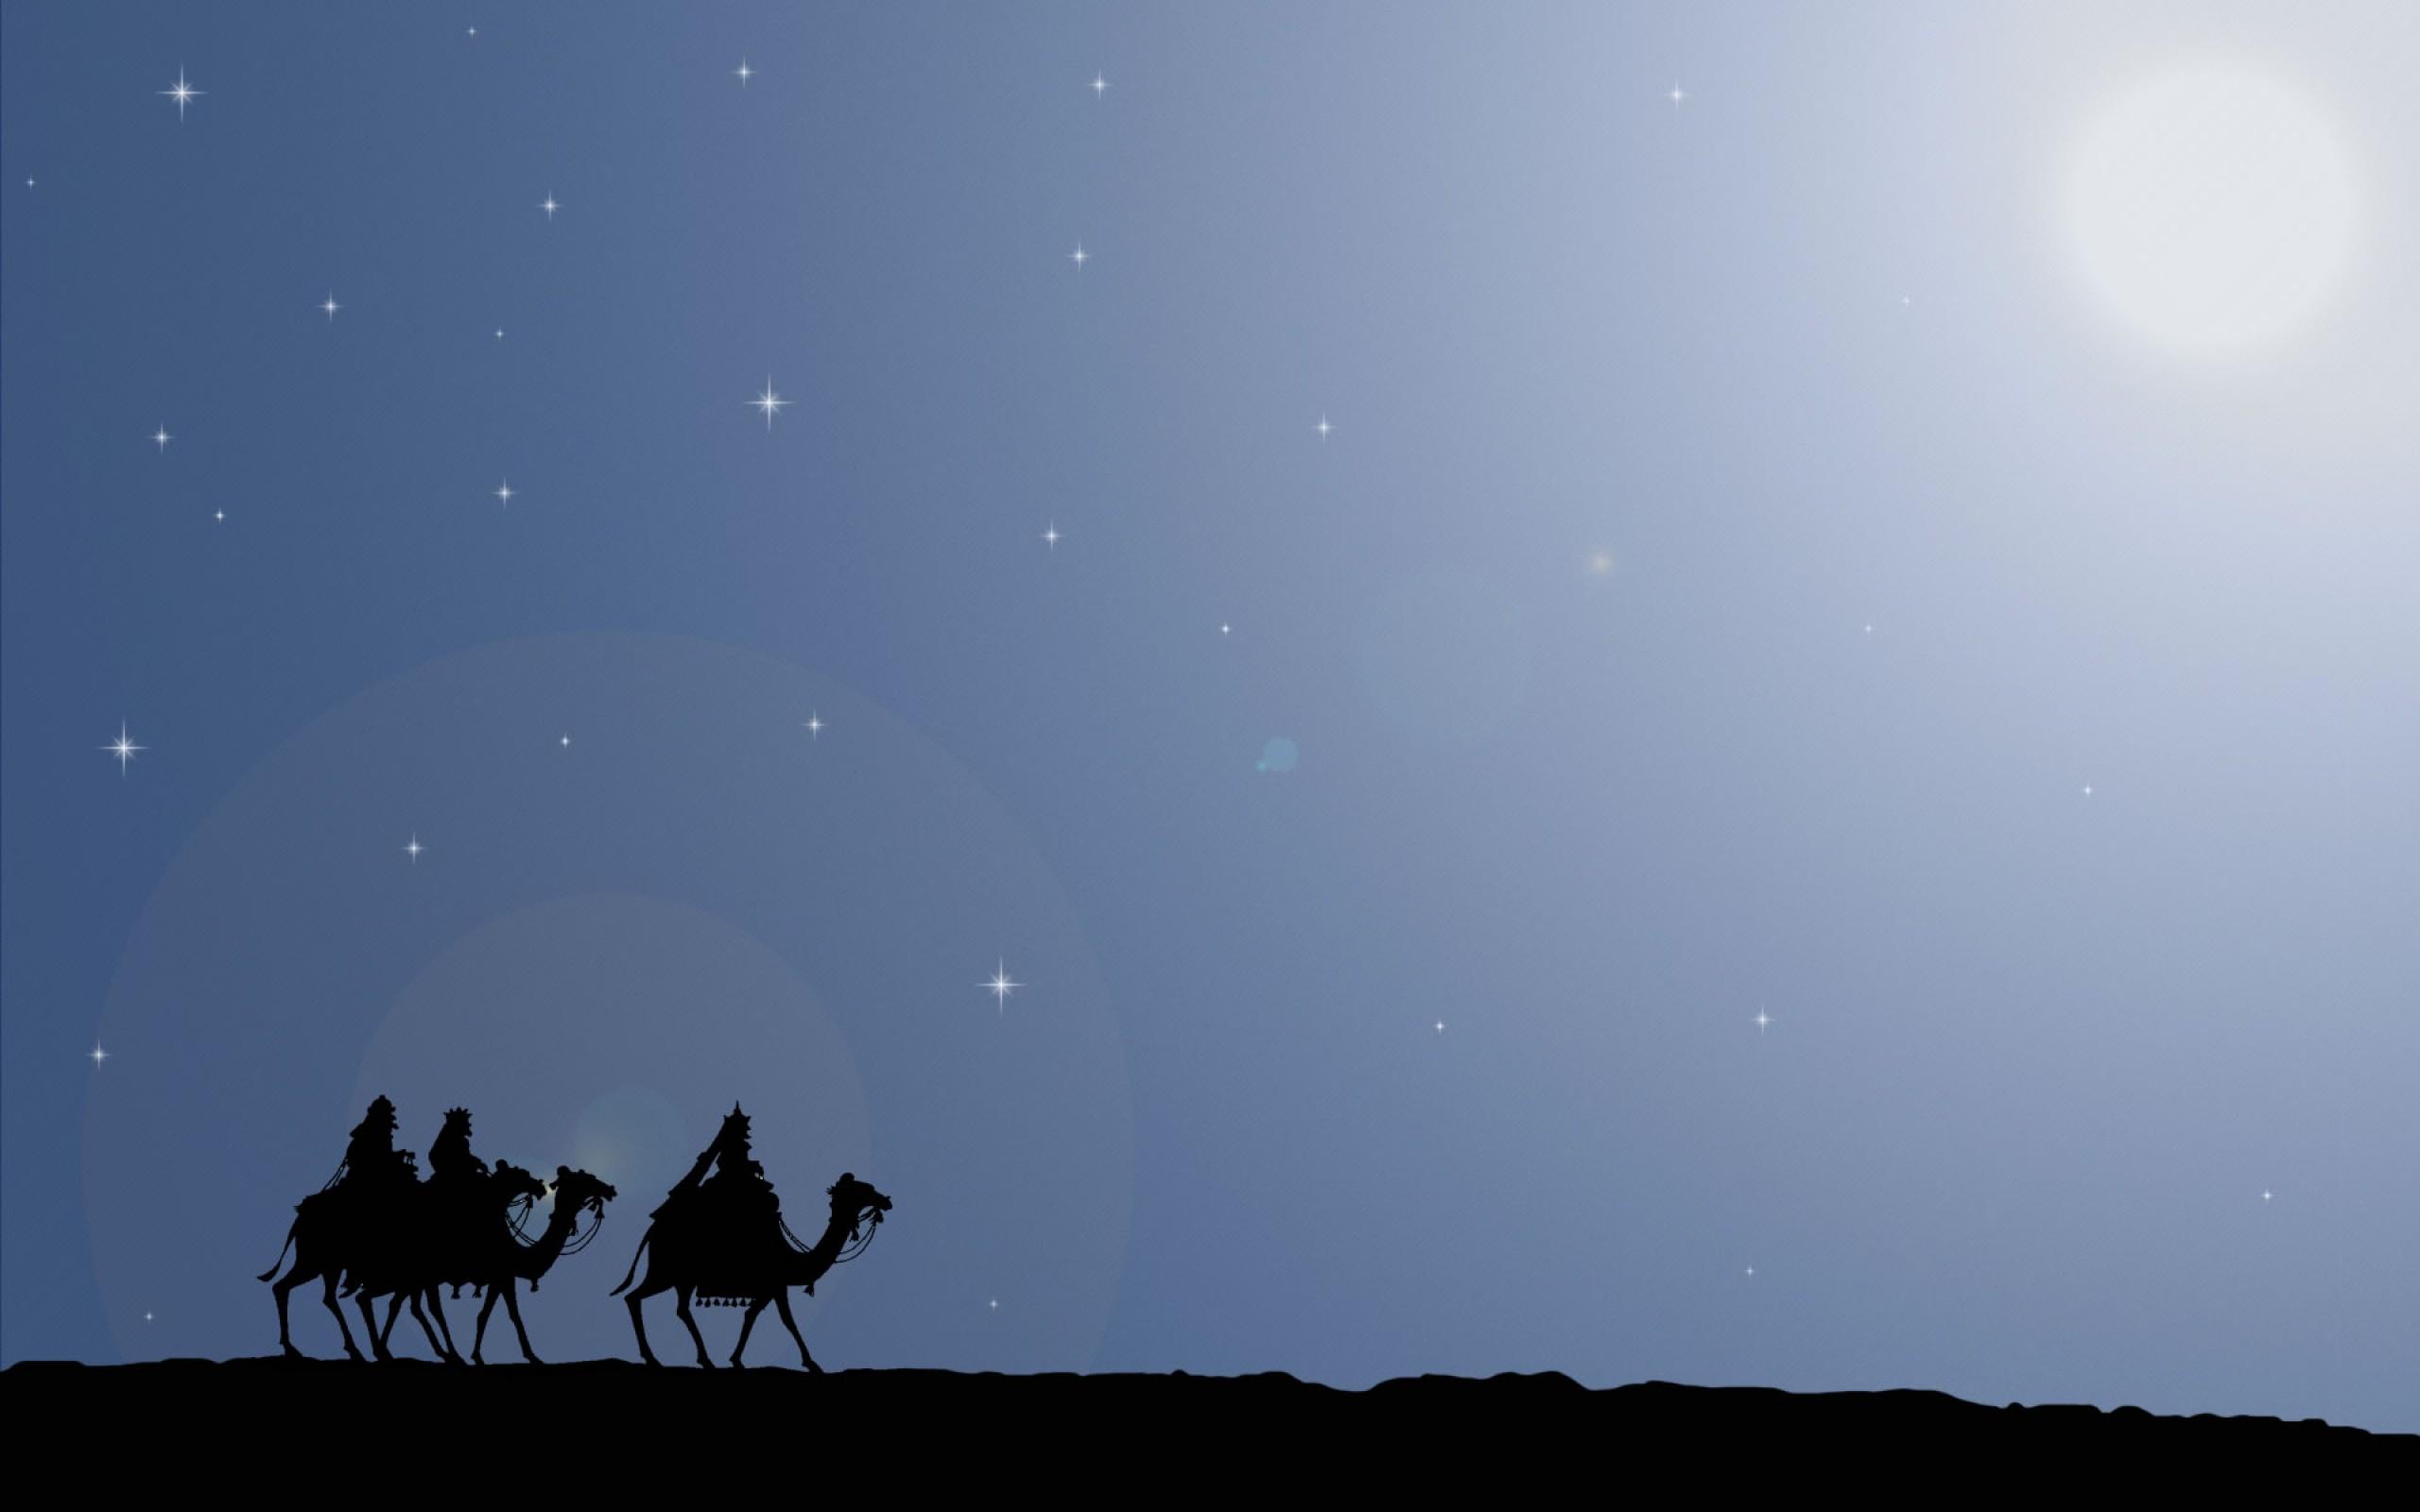 artaban-cuentos-reyes-magos-navidad-melchor-gaspar-baltasar-regalos-epifania